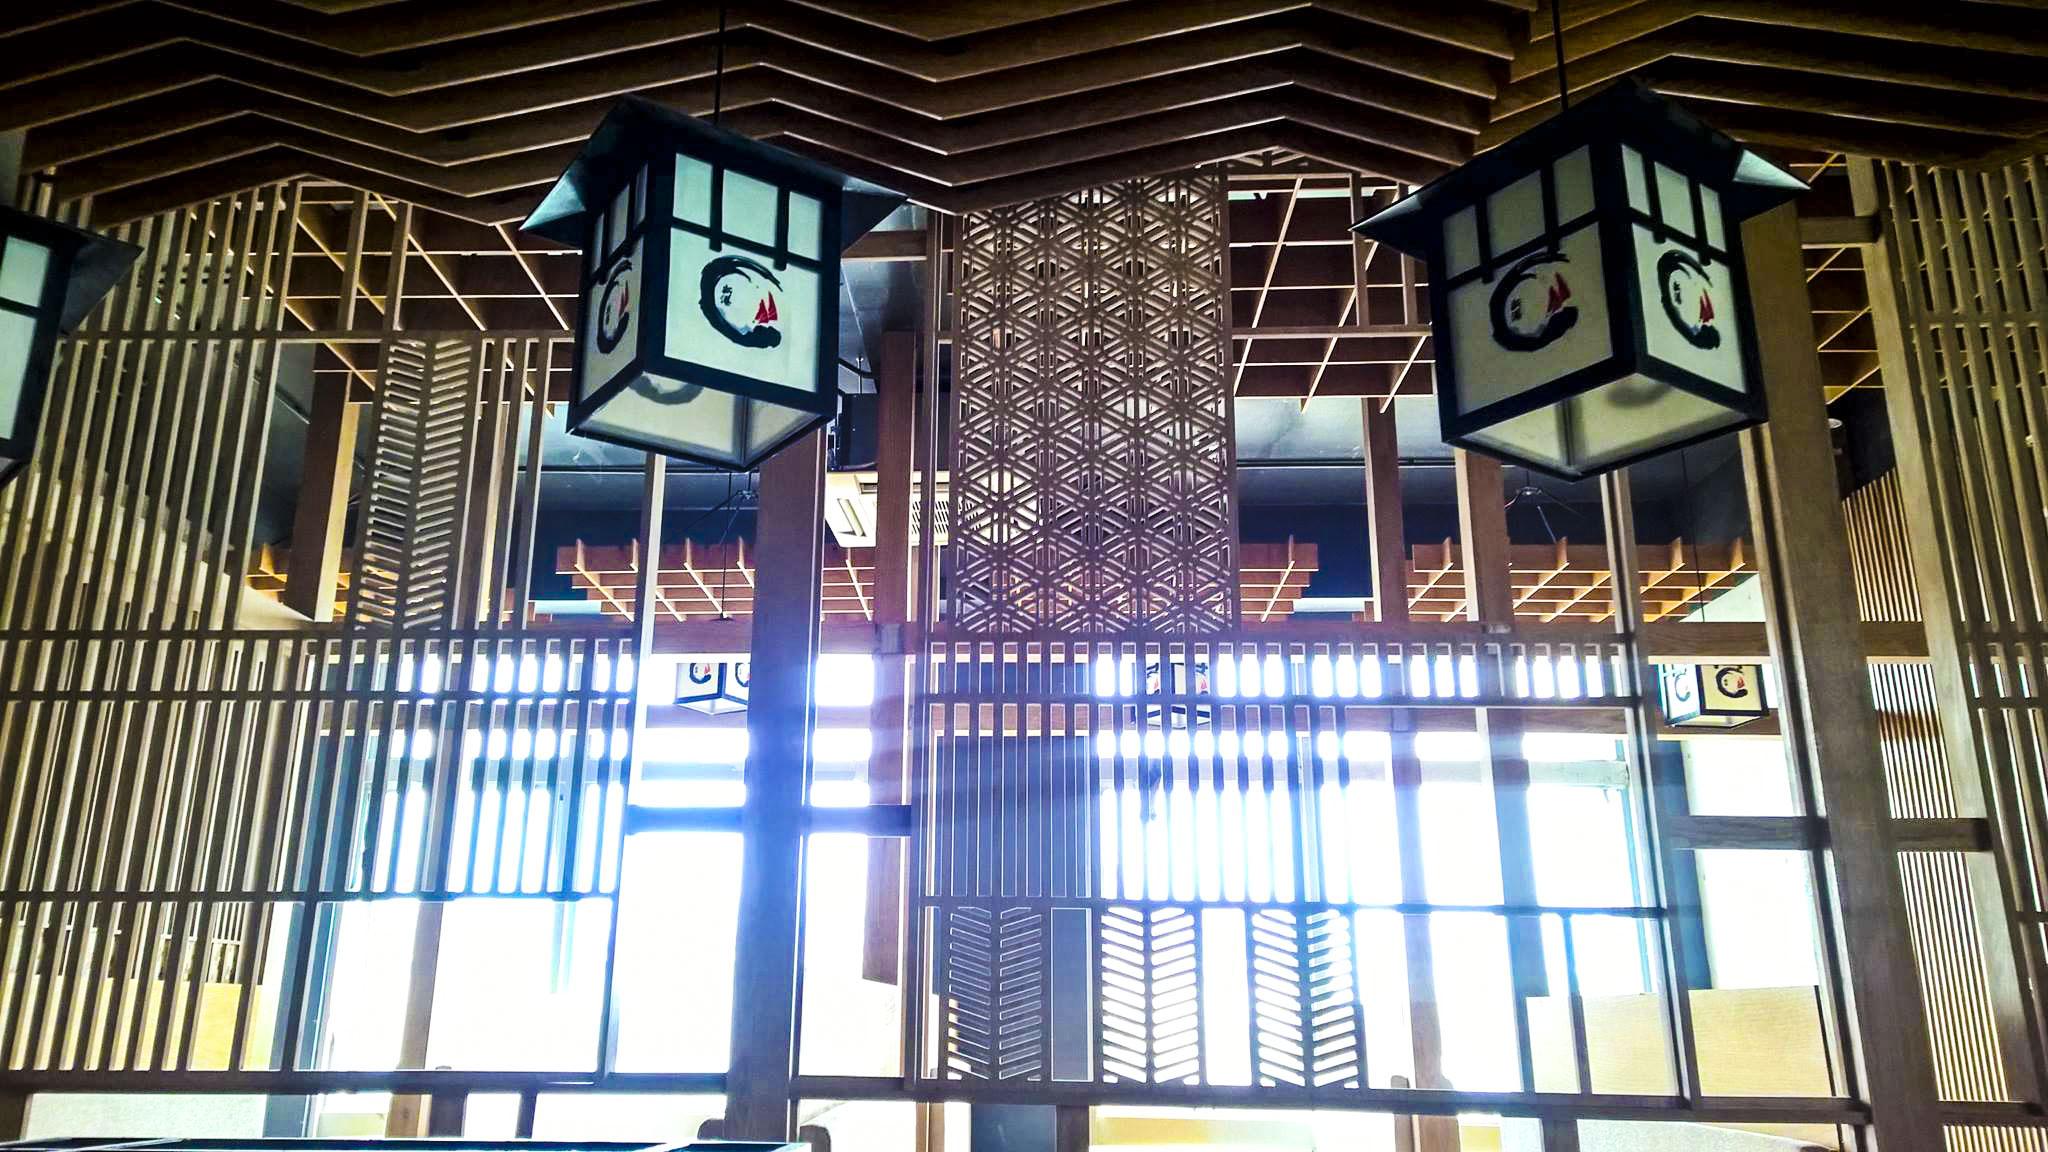 thiet-ke-noi-that-nha-hang-shinko-restaurant189